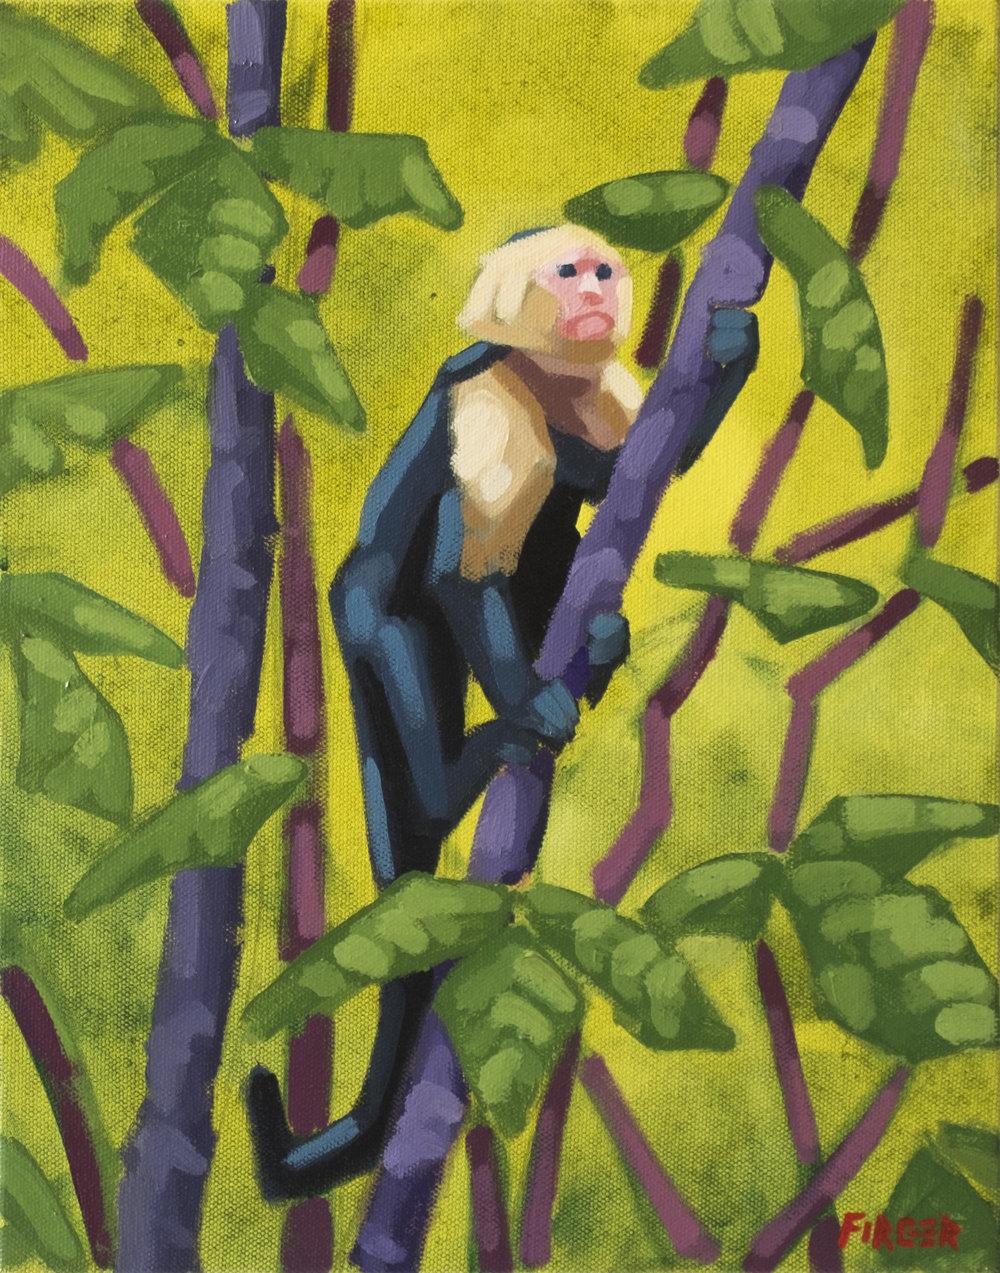 Jungle Climber II - 11 x 14, Acrylic on Canvas